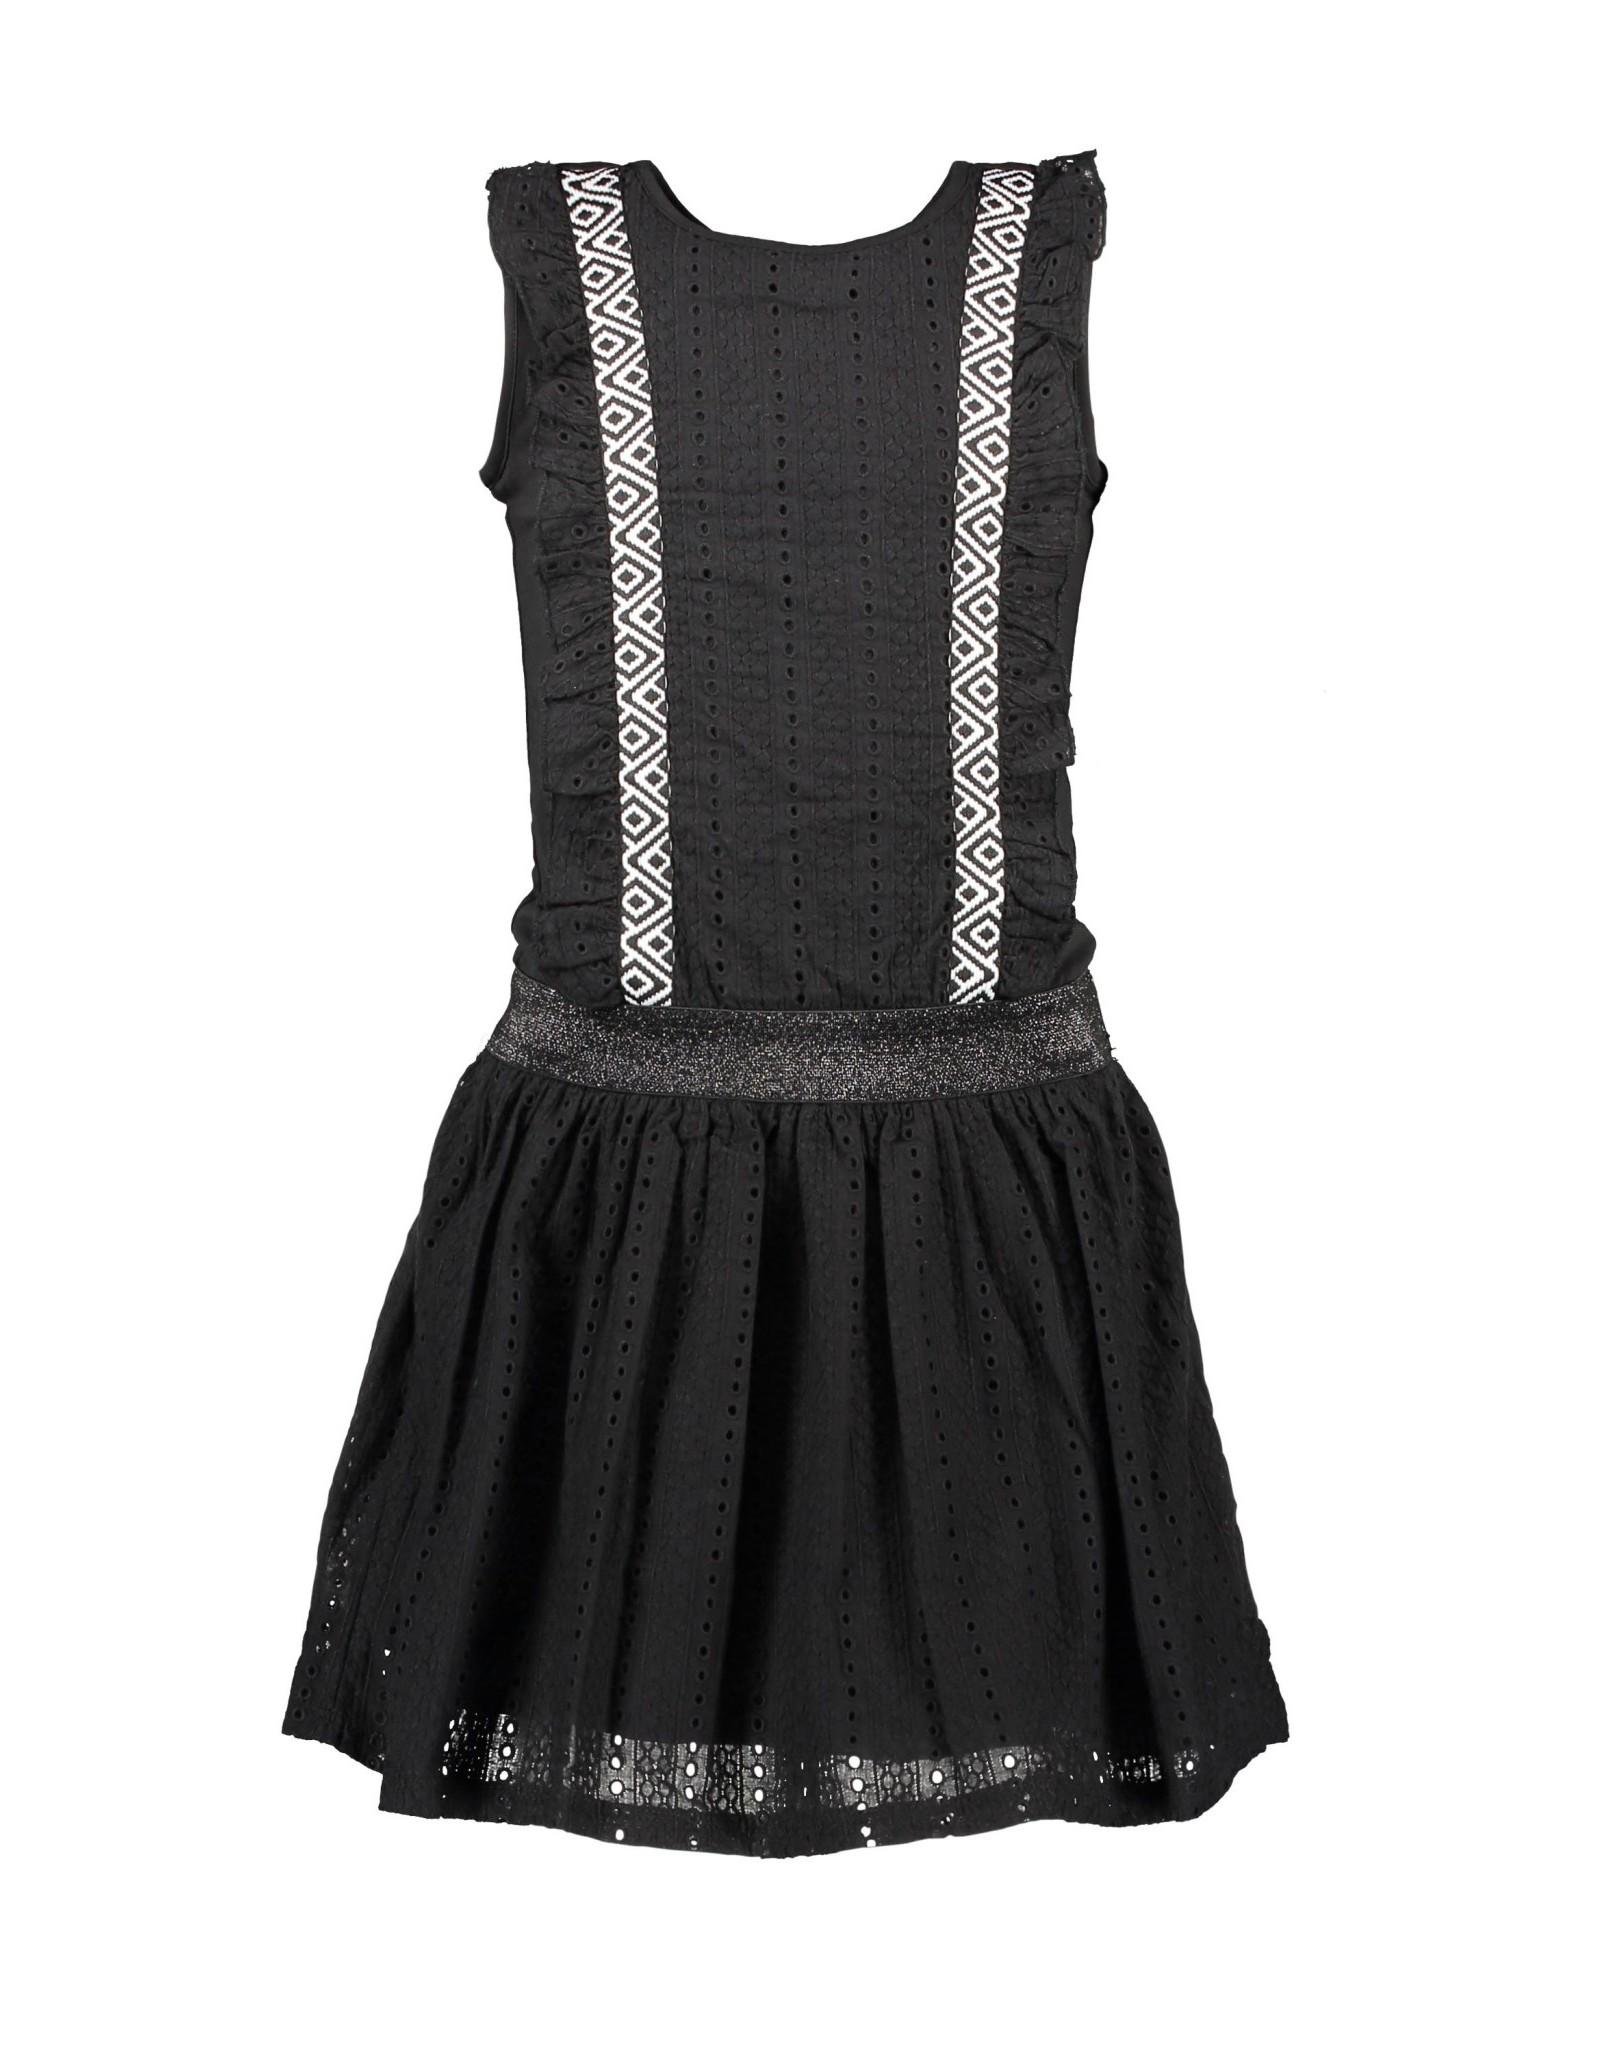 B.Nosy B.Nosy meisjes jurk met kant en roesels Black